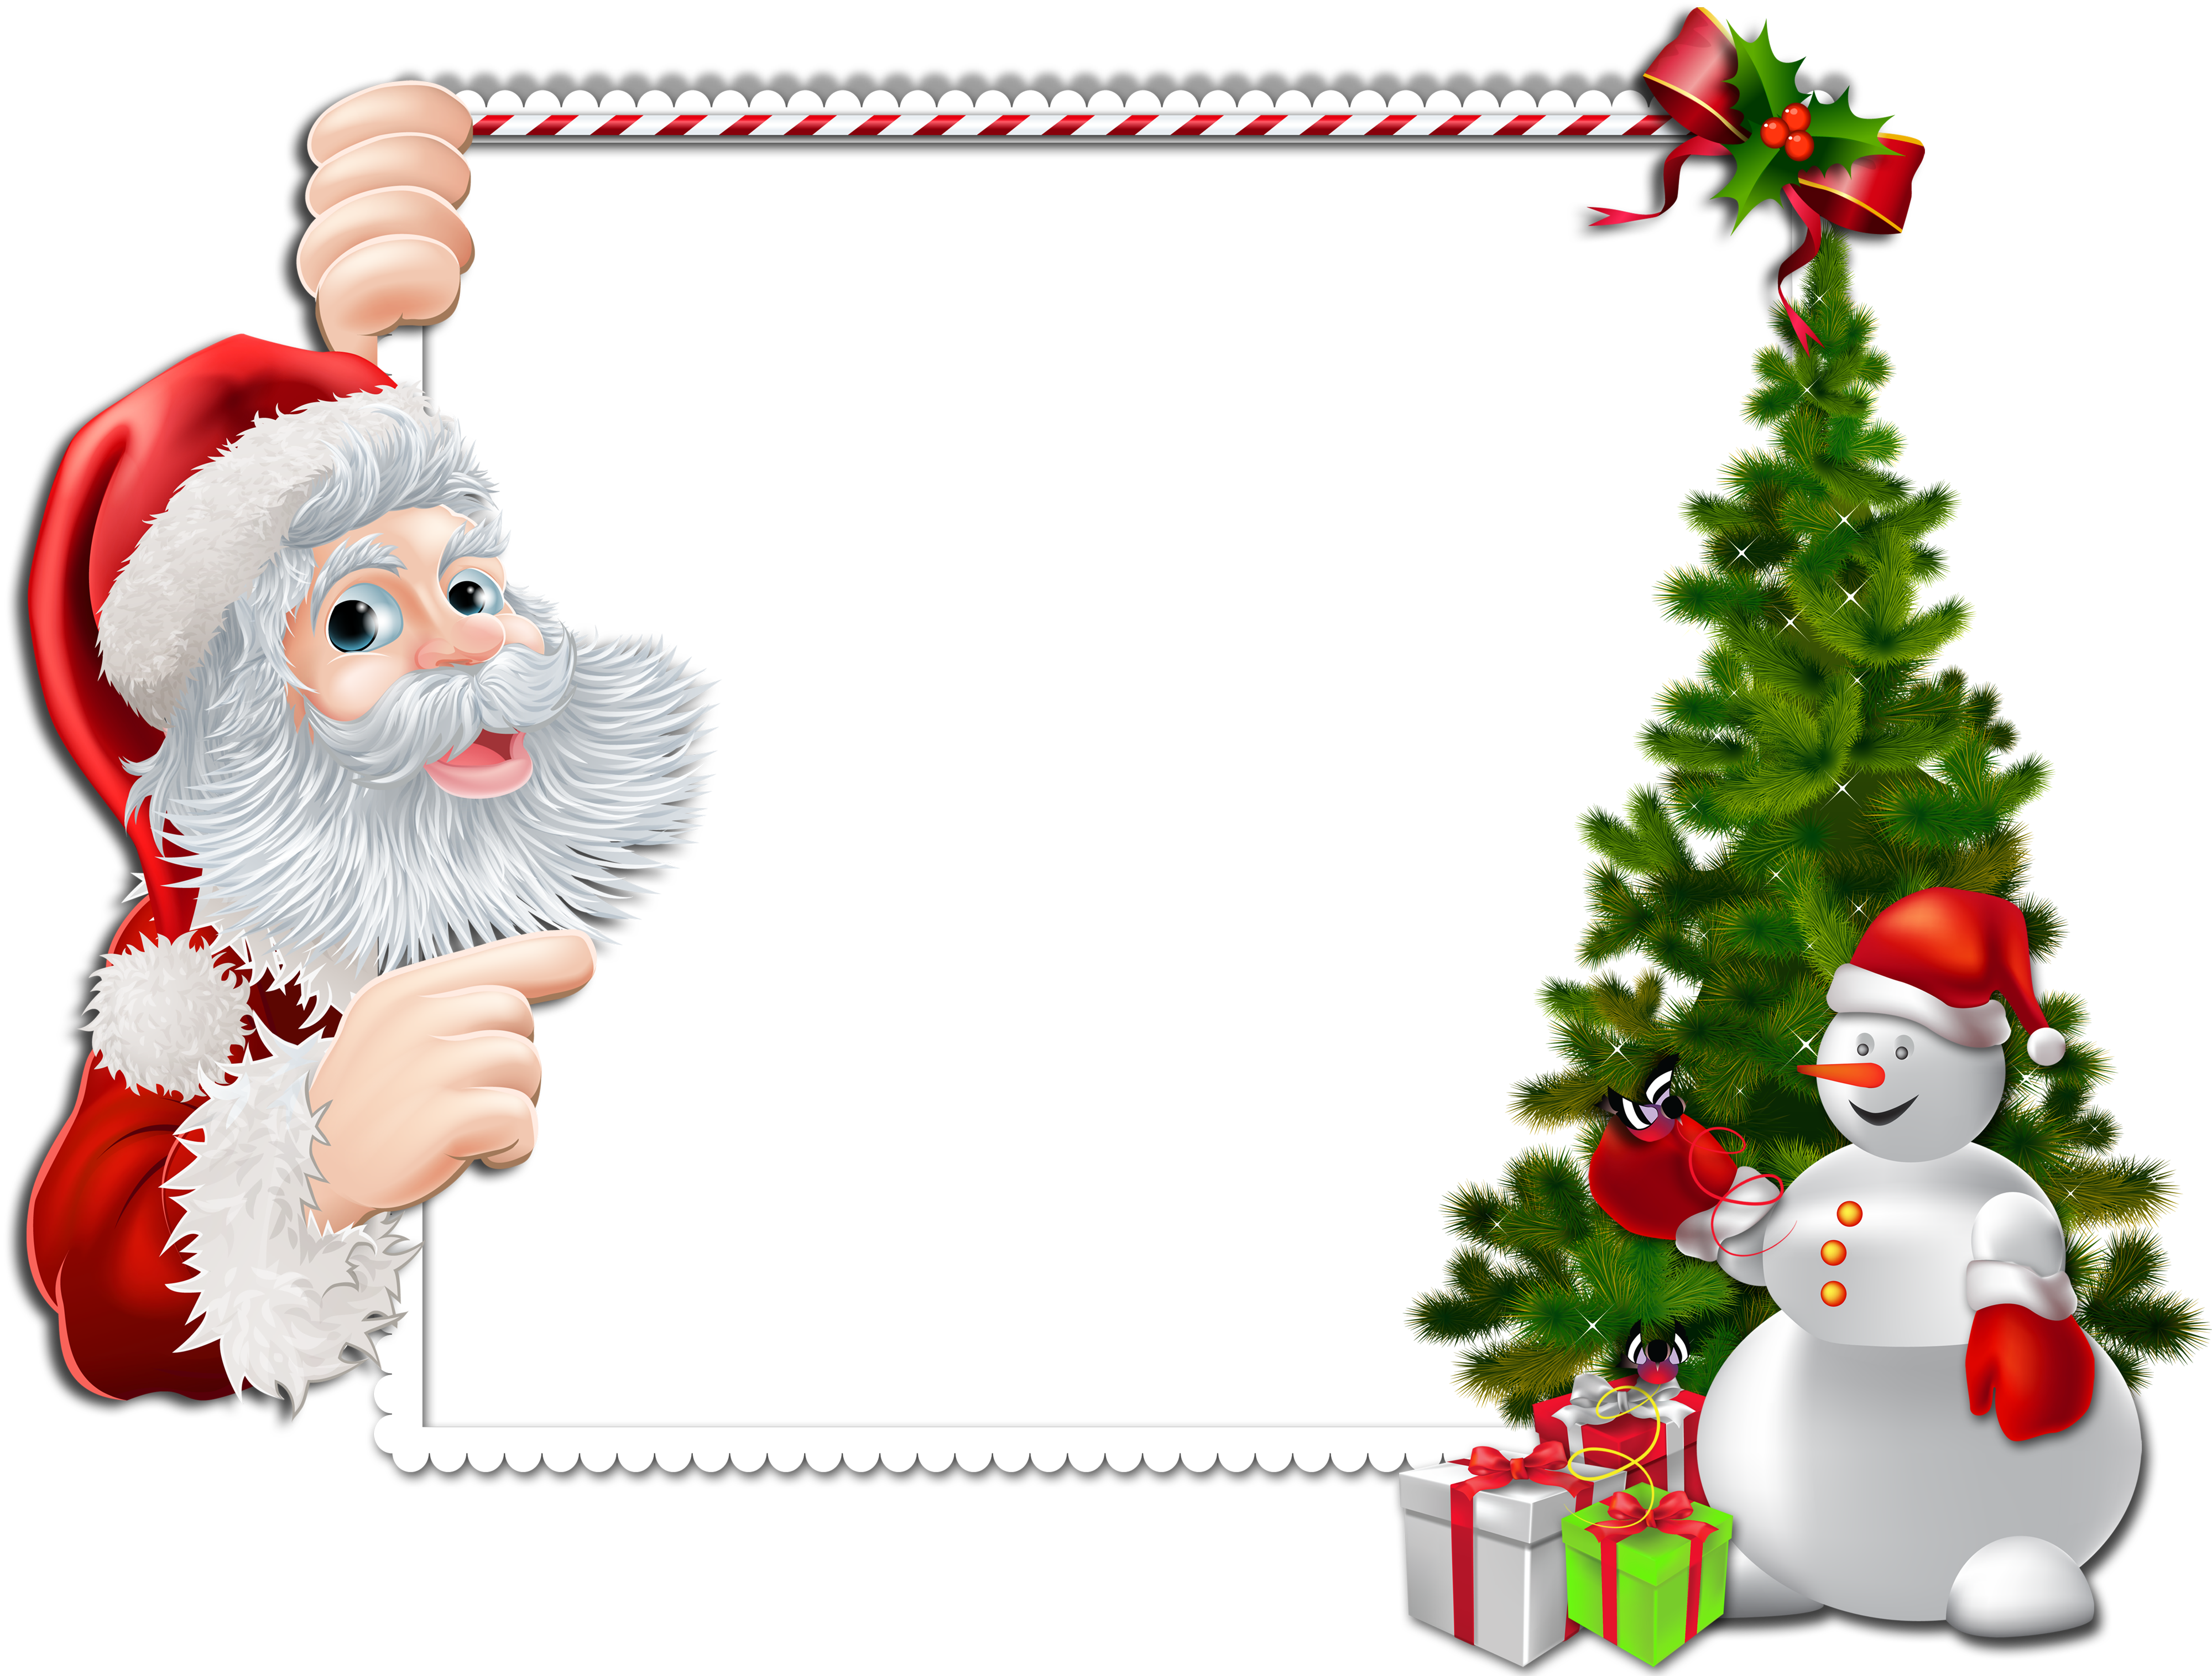 Frame clipart santa claus Claus frame png christmas